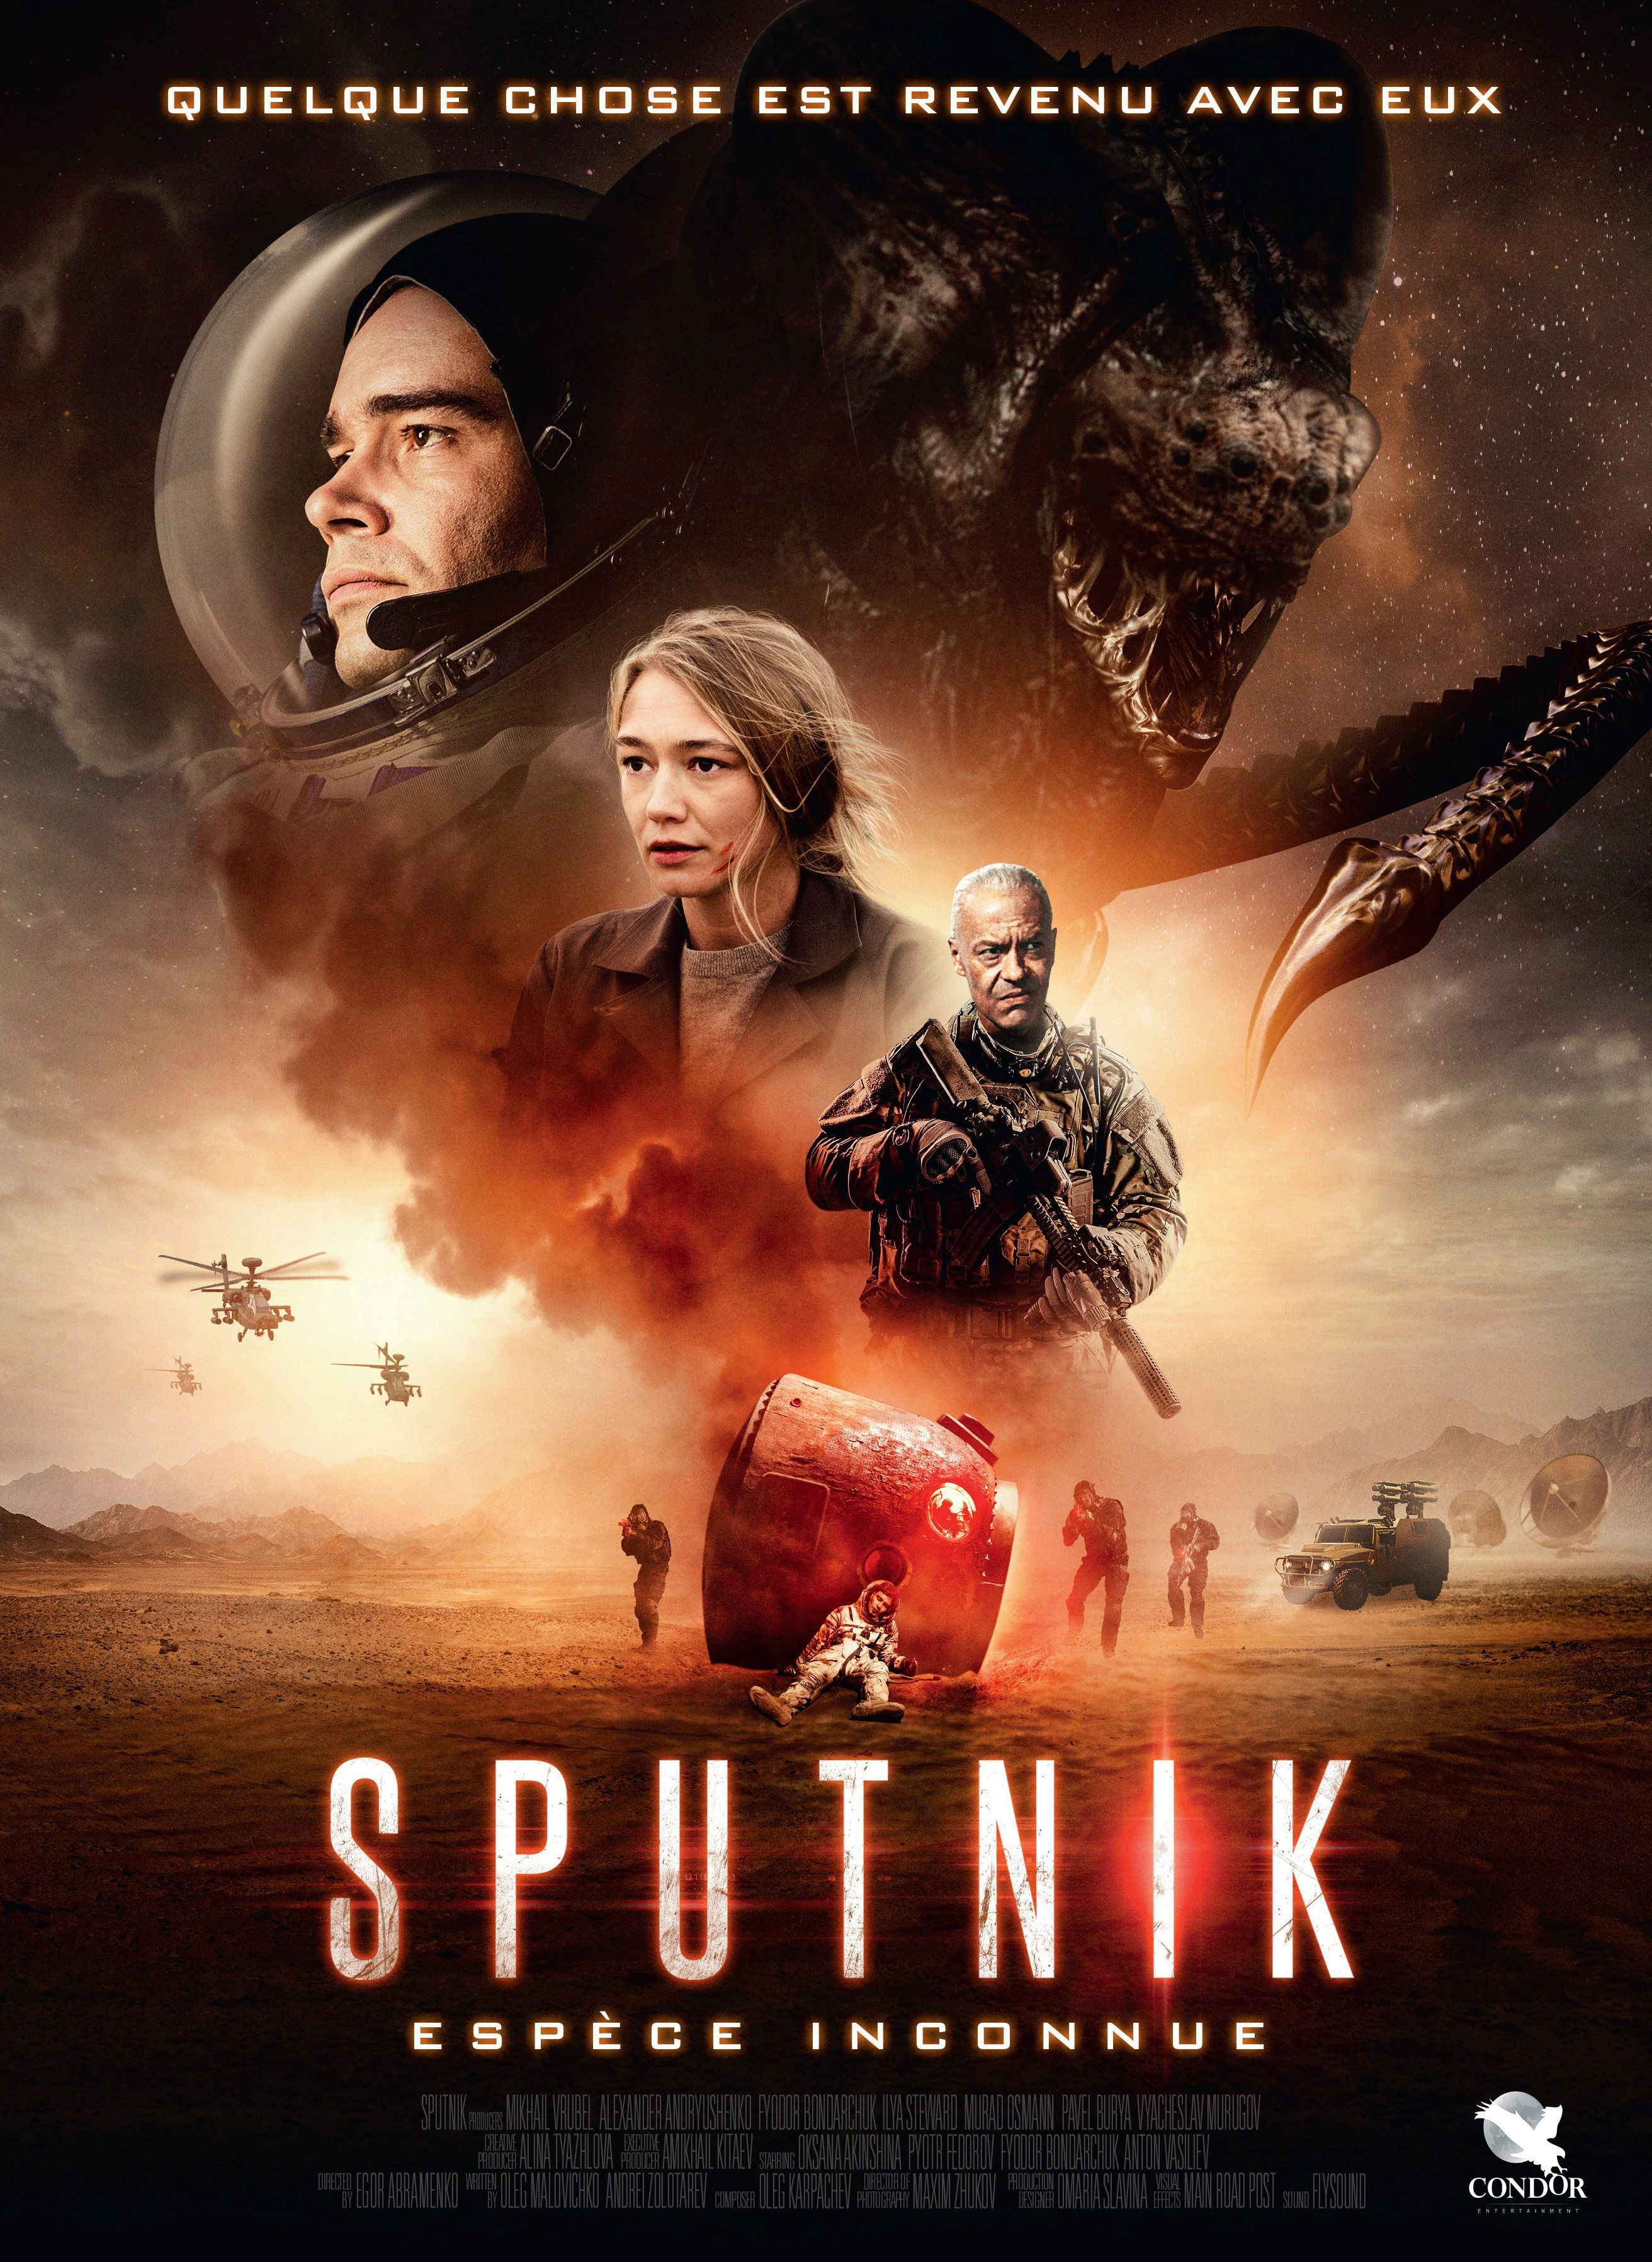 Sputnik, espèce inconnue - Film (2021)